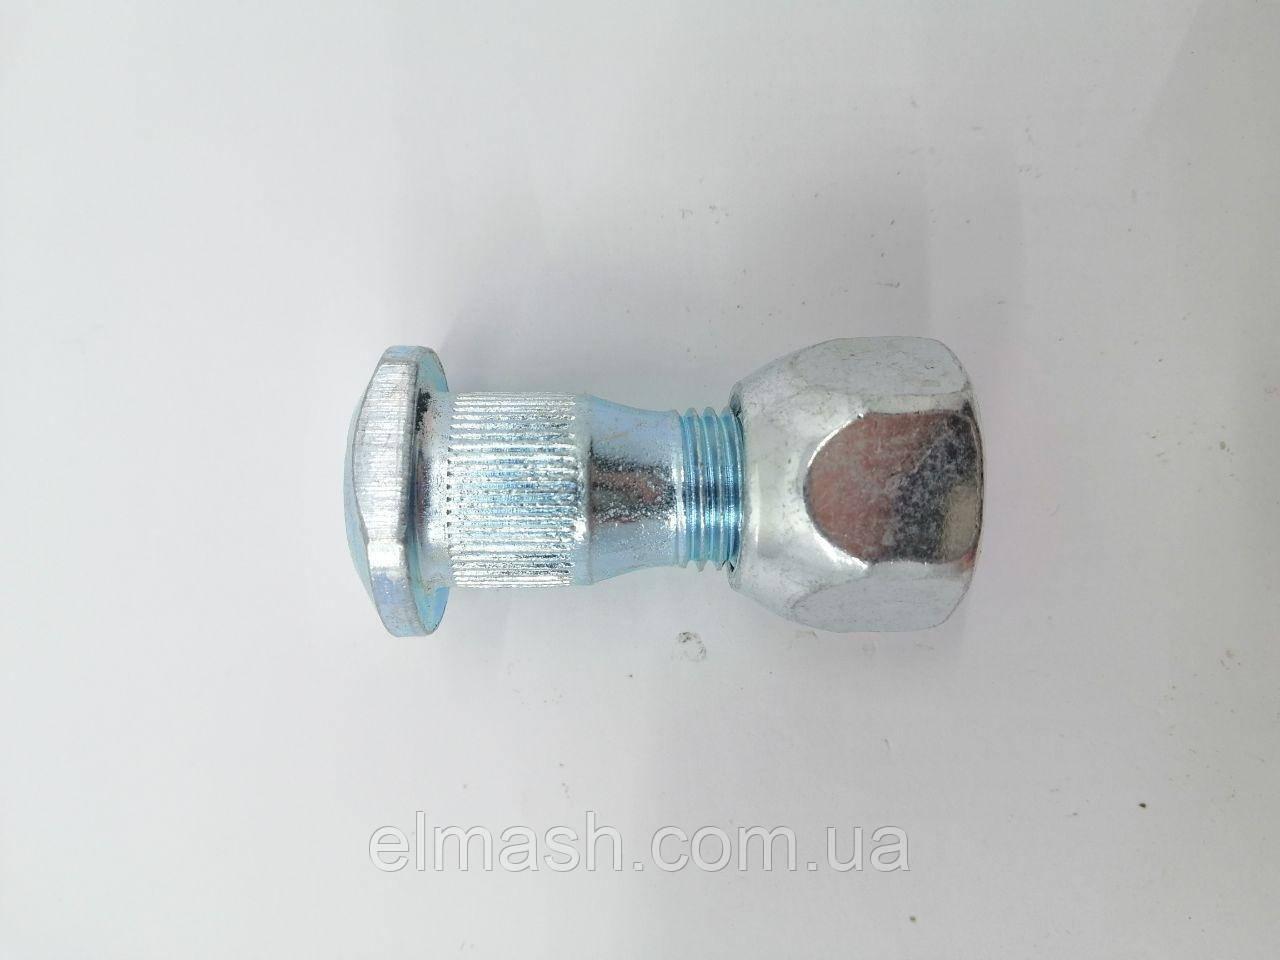 Болт ступицы переднего колеса ГАЗ 2410, 31029 (М14х1,5х45) (пр-во ГАЗ)